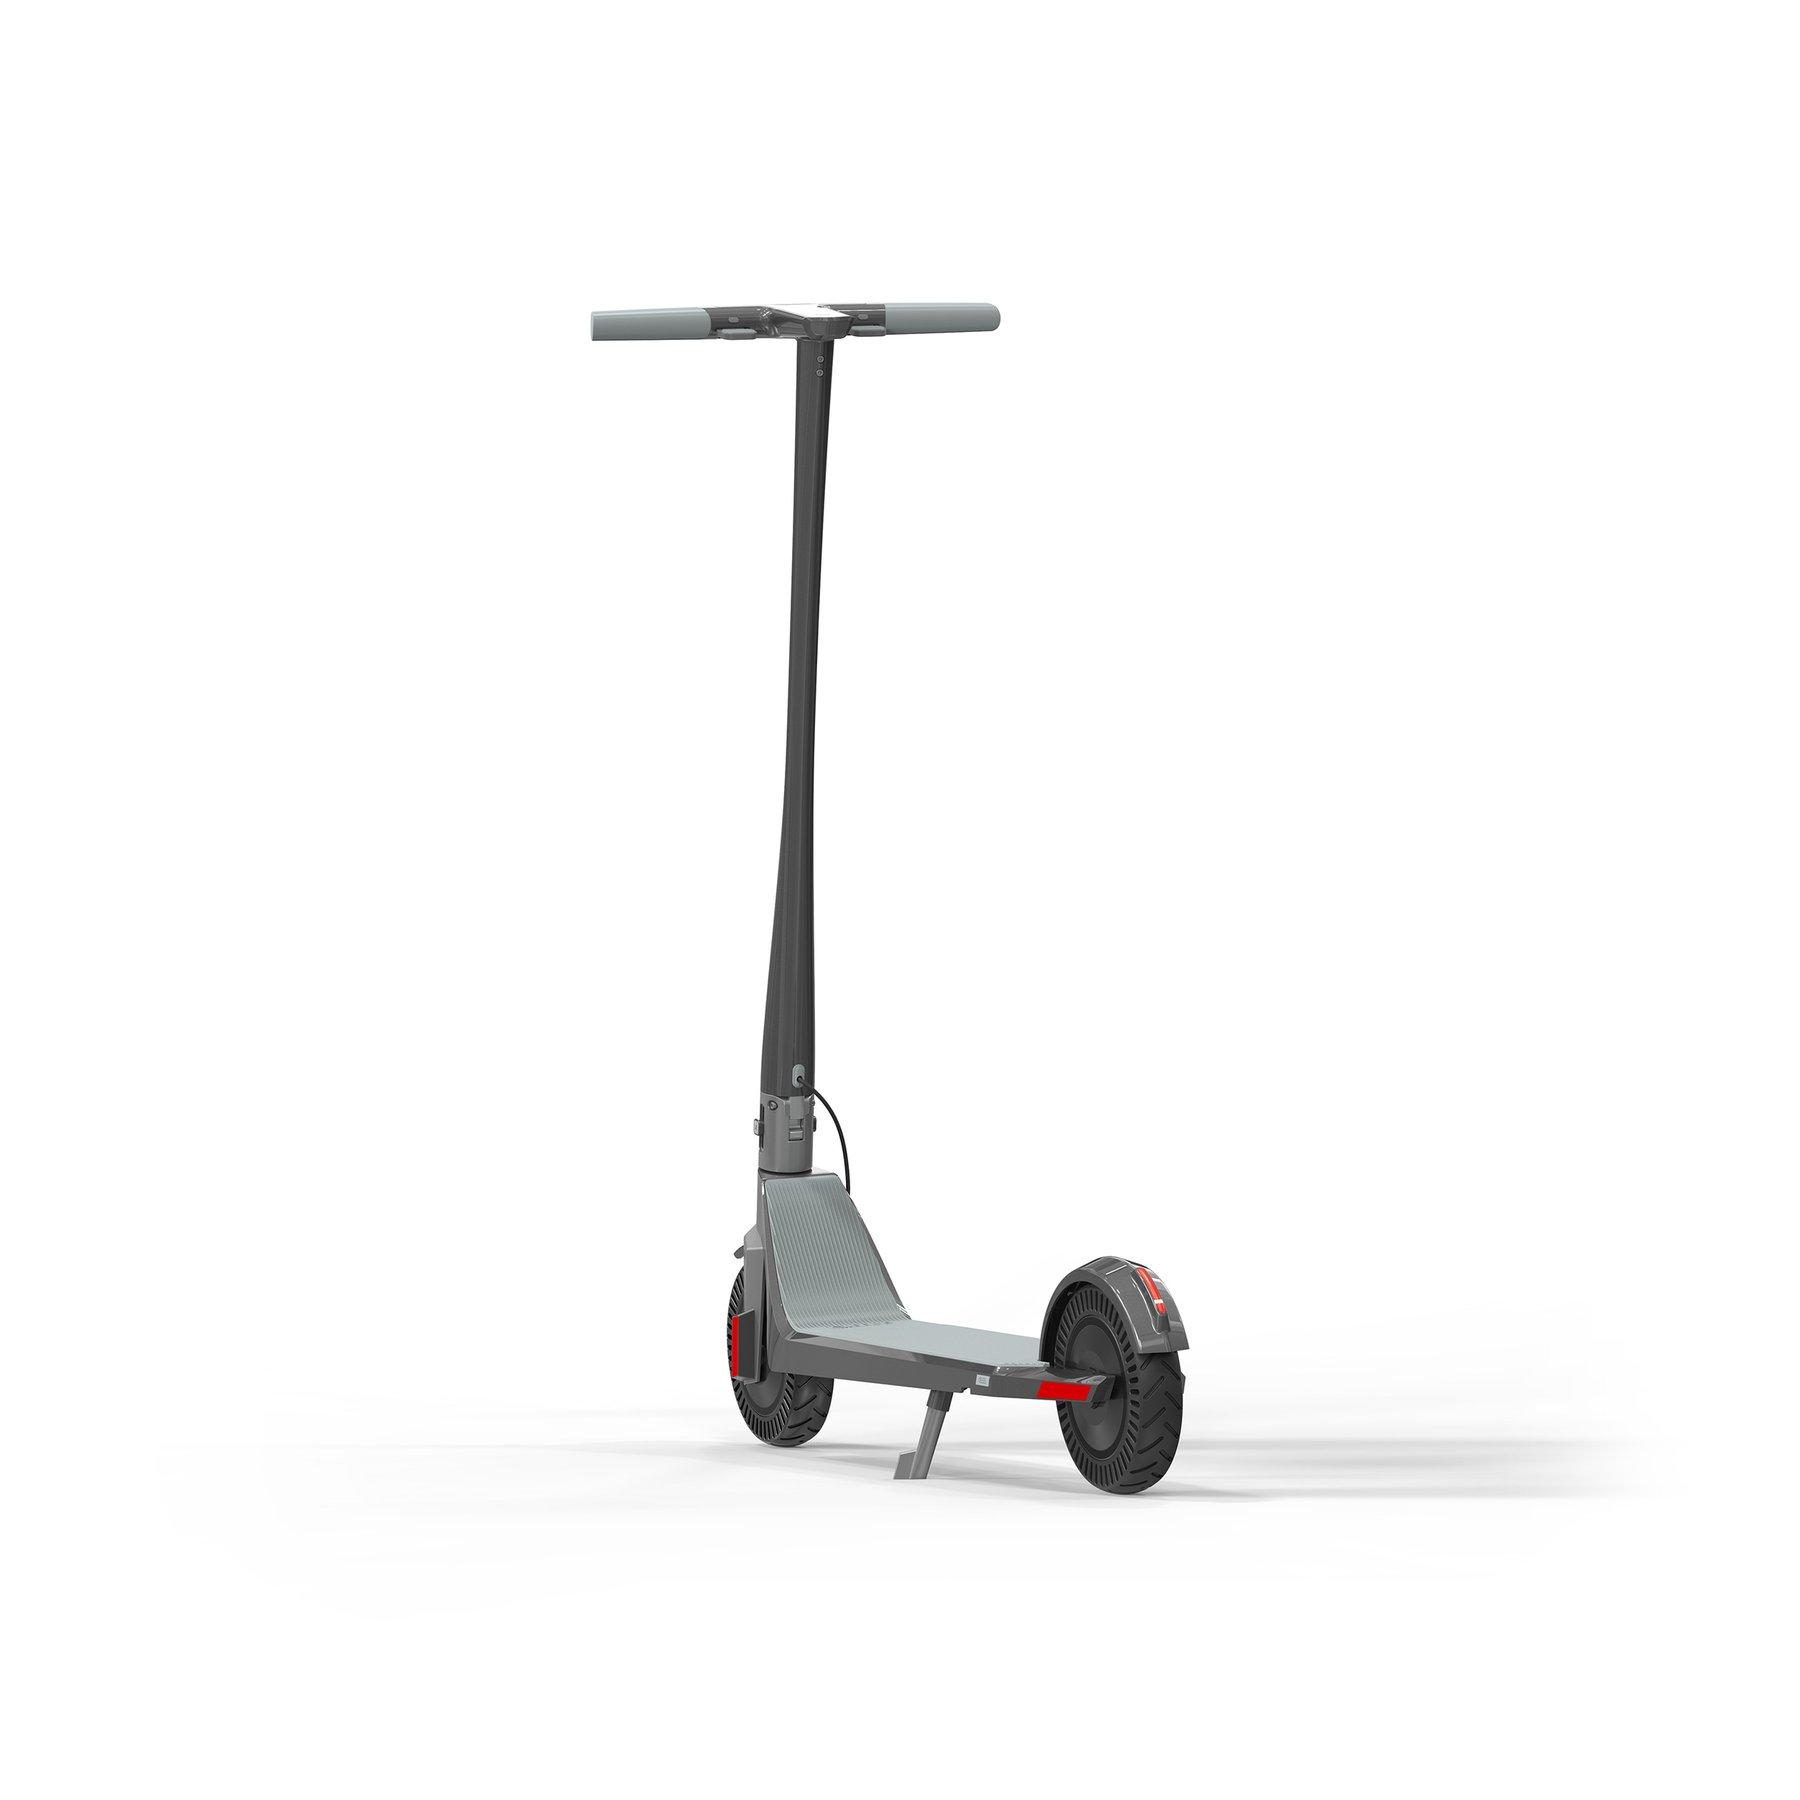 scooter_gotham_014_1800x1800.jpg